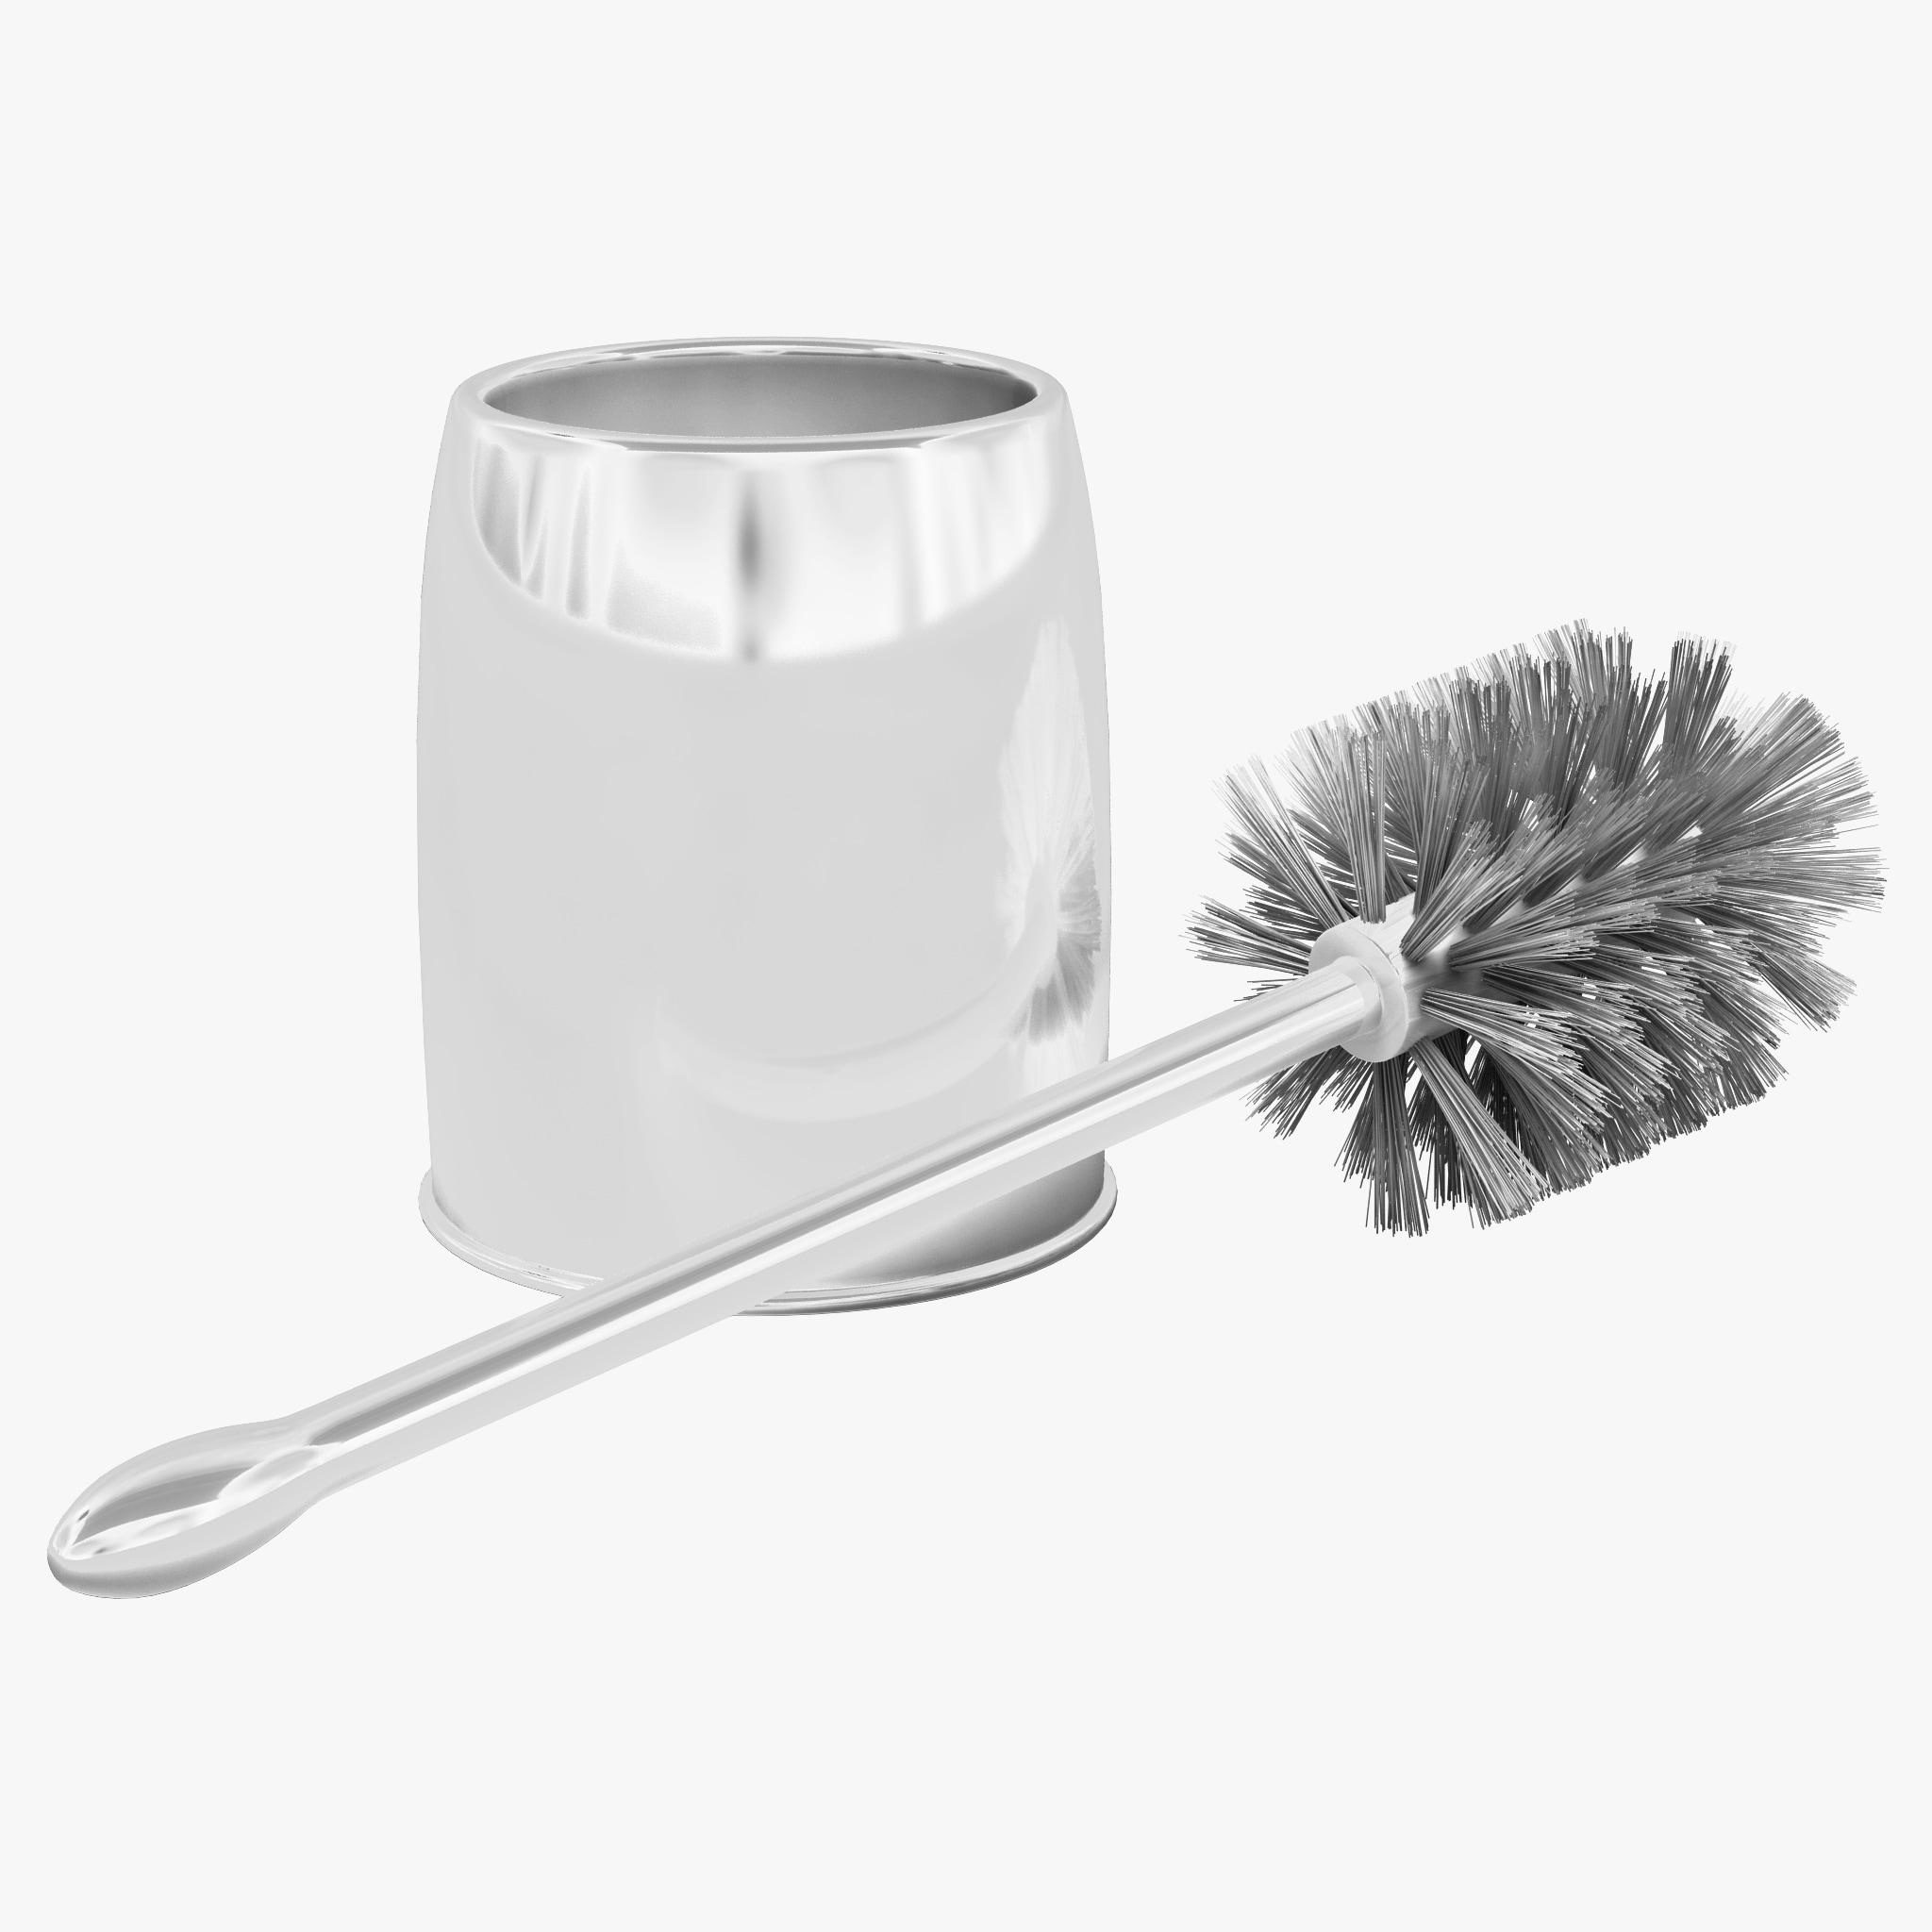 3d model casabella bowl brush set